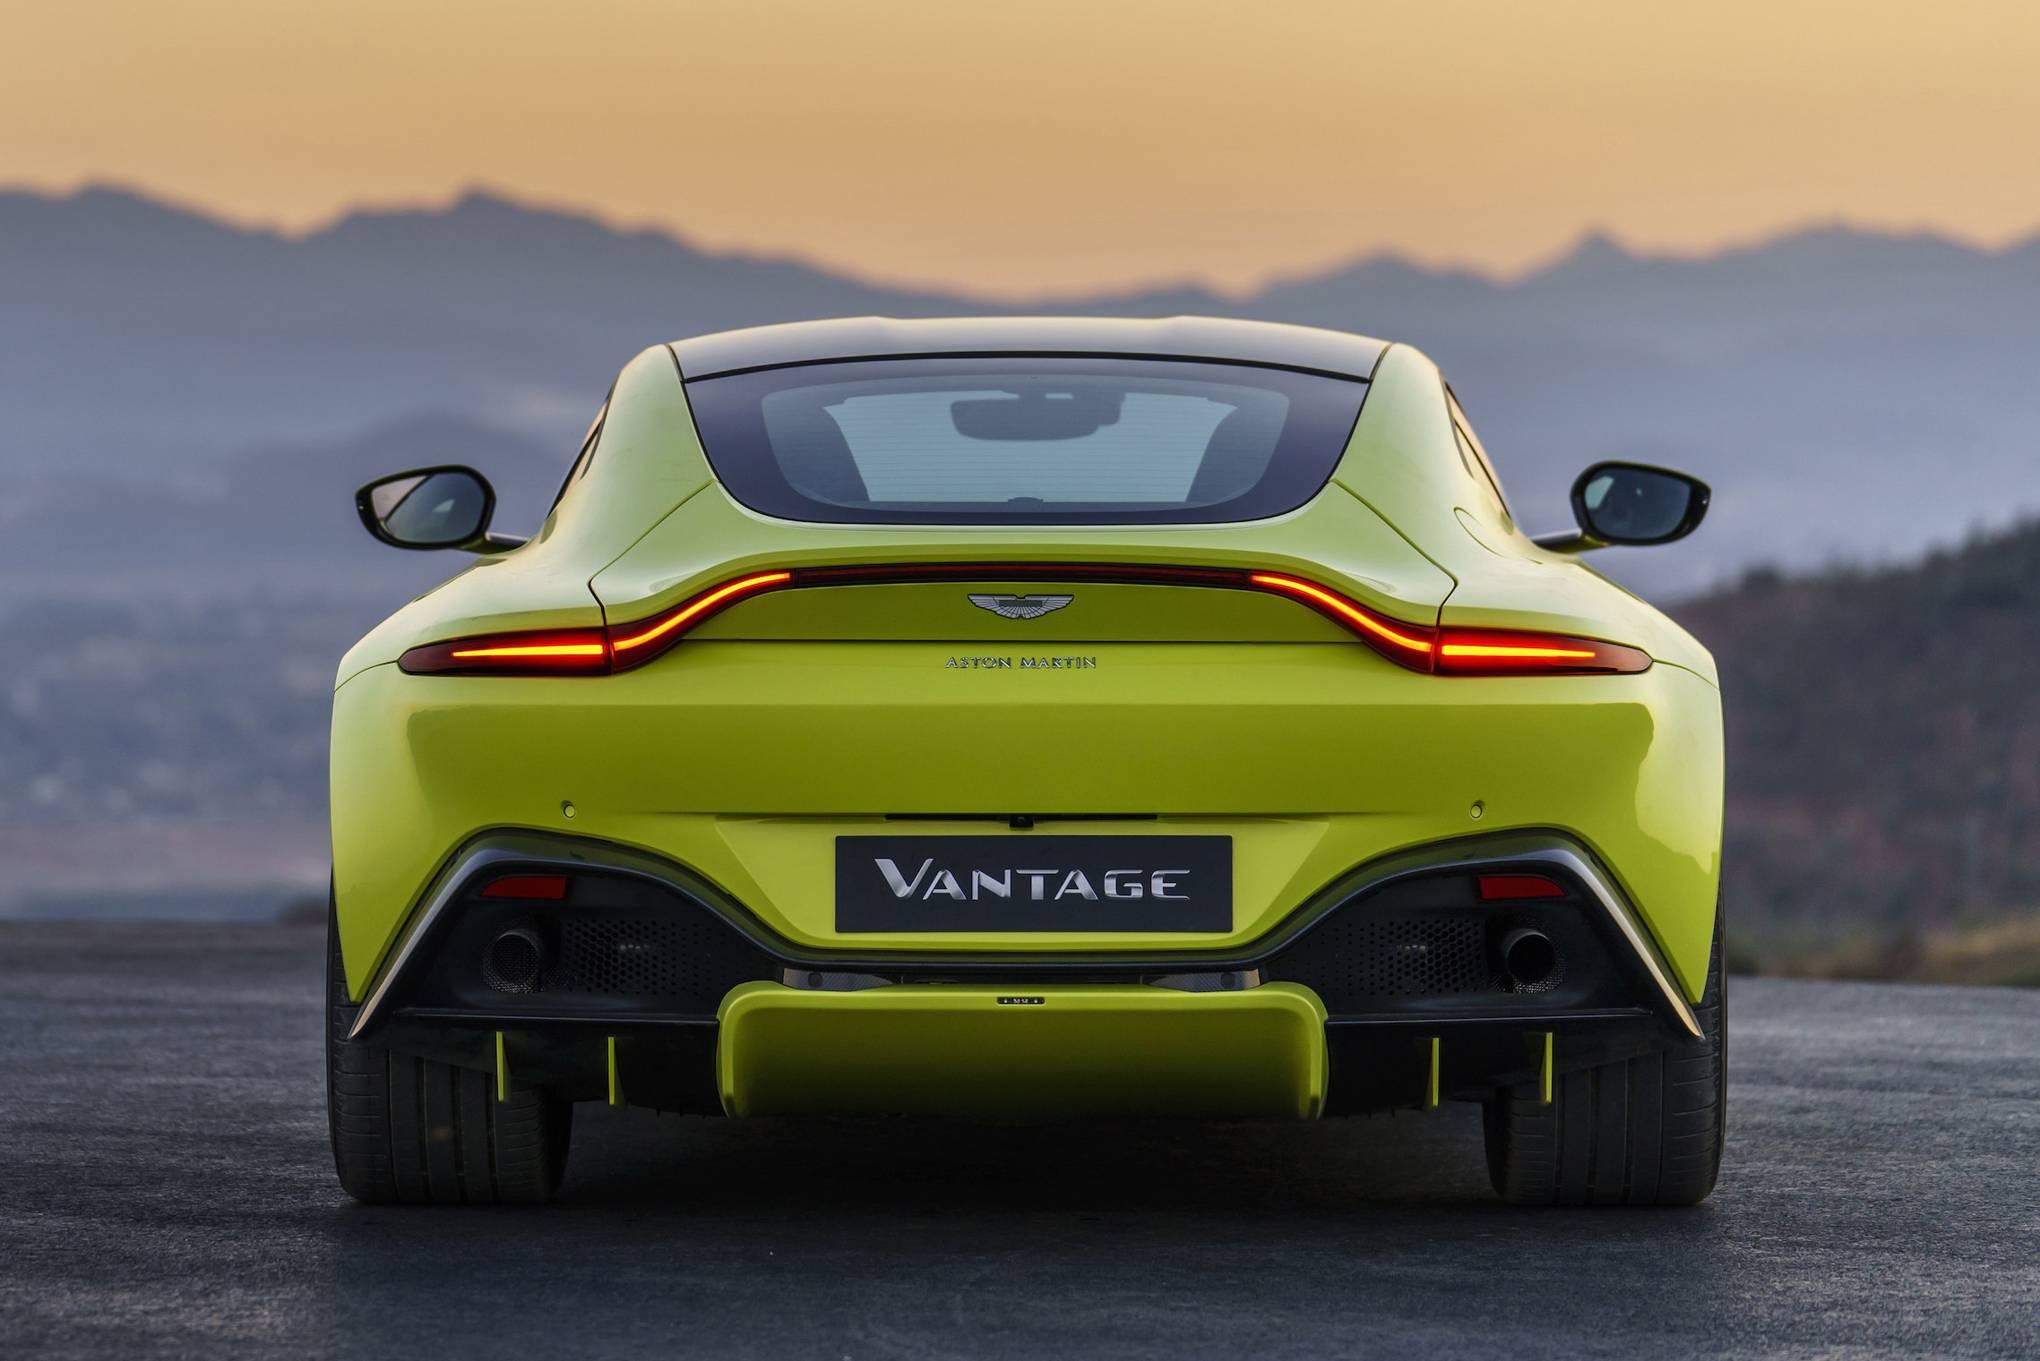 New Aston Martin >> Aston Martin S Biggest Investor Considers Acquiring Another